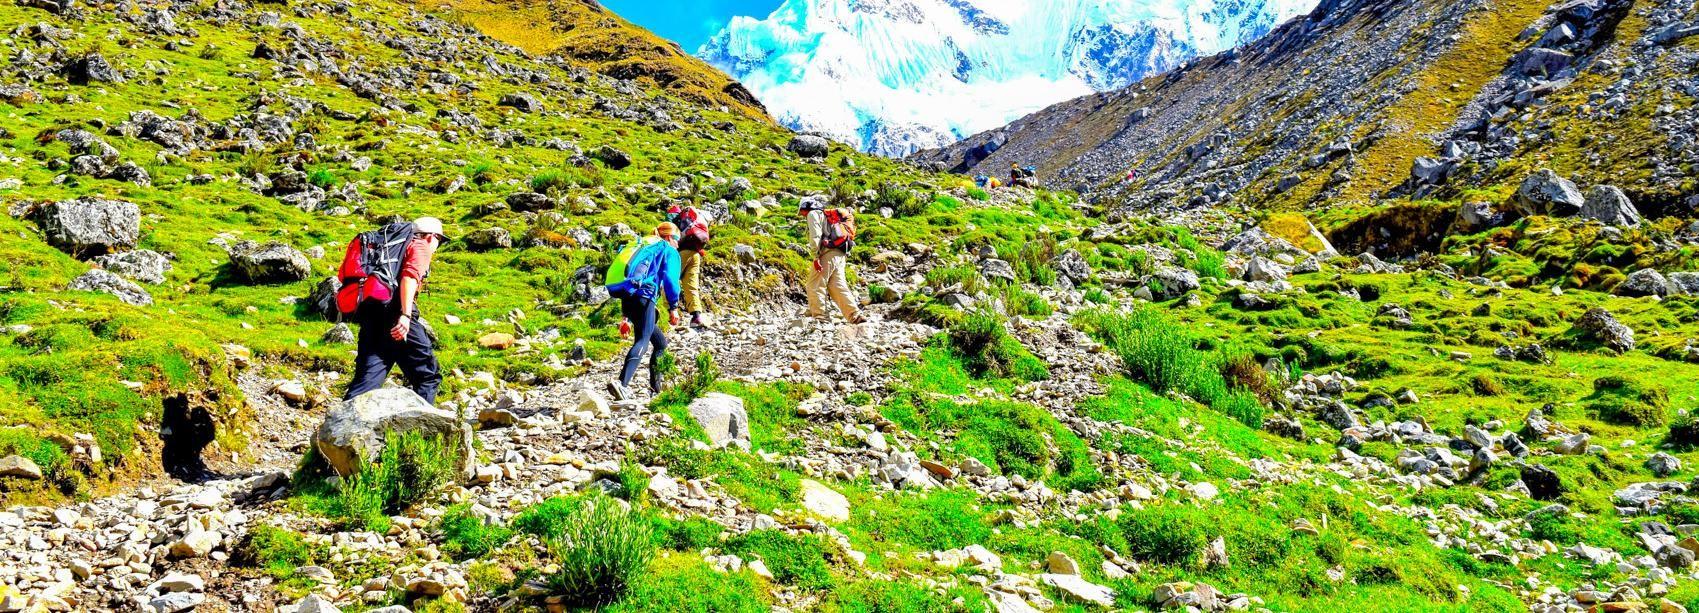 Cusco: 5-Day Salkantay Ultimate Trek to Machu Picchu